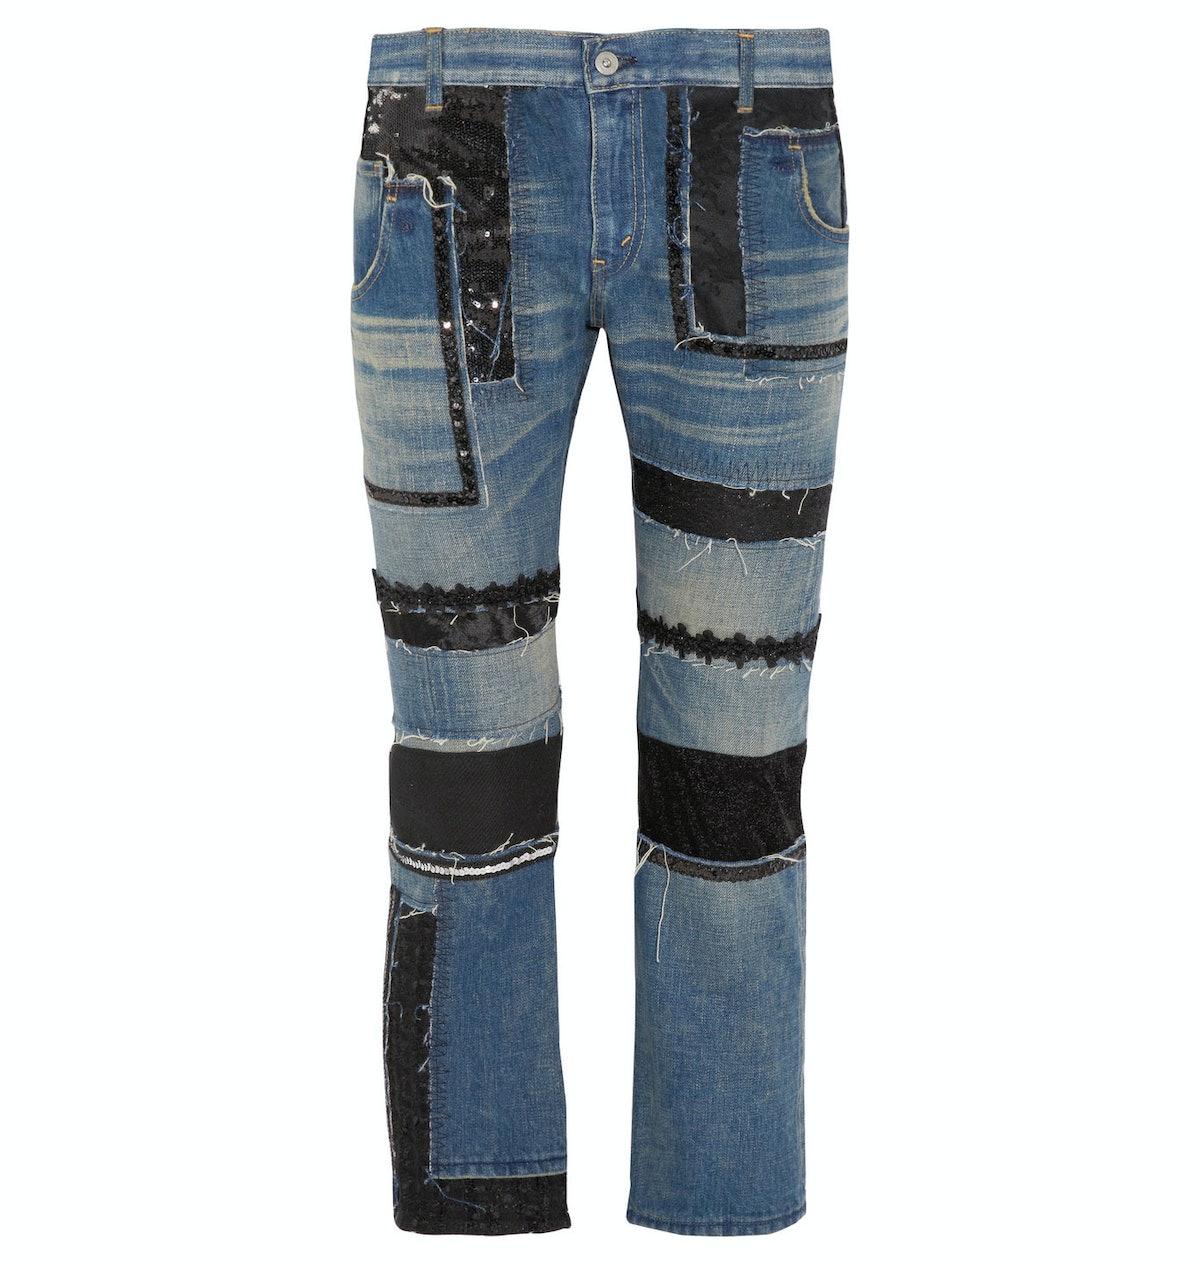 Junya Watanabe jeans